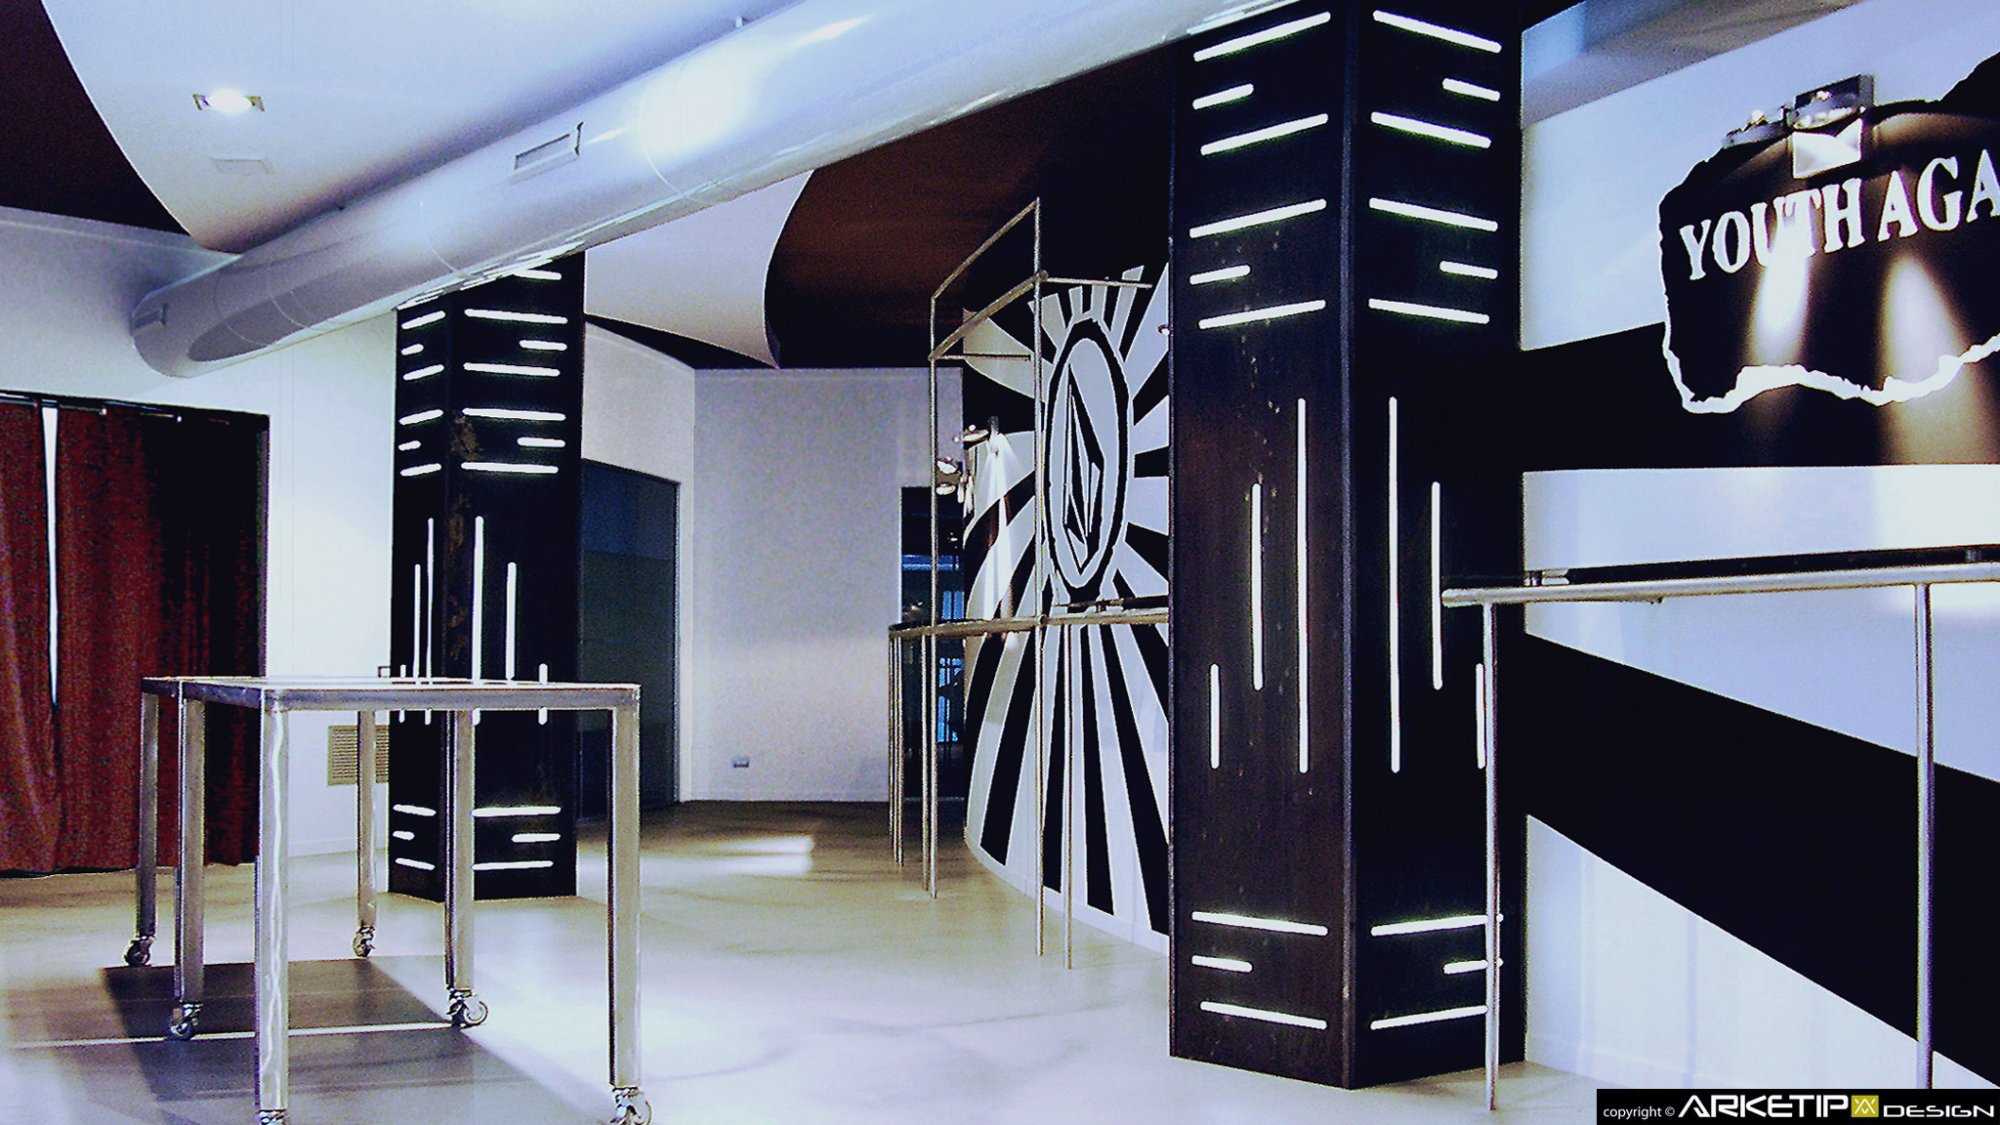 Arredamento showroom volcom store negozio milano for Showroom milano arredamento